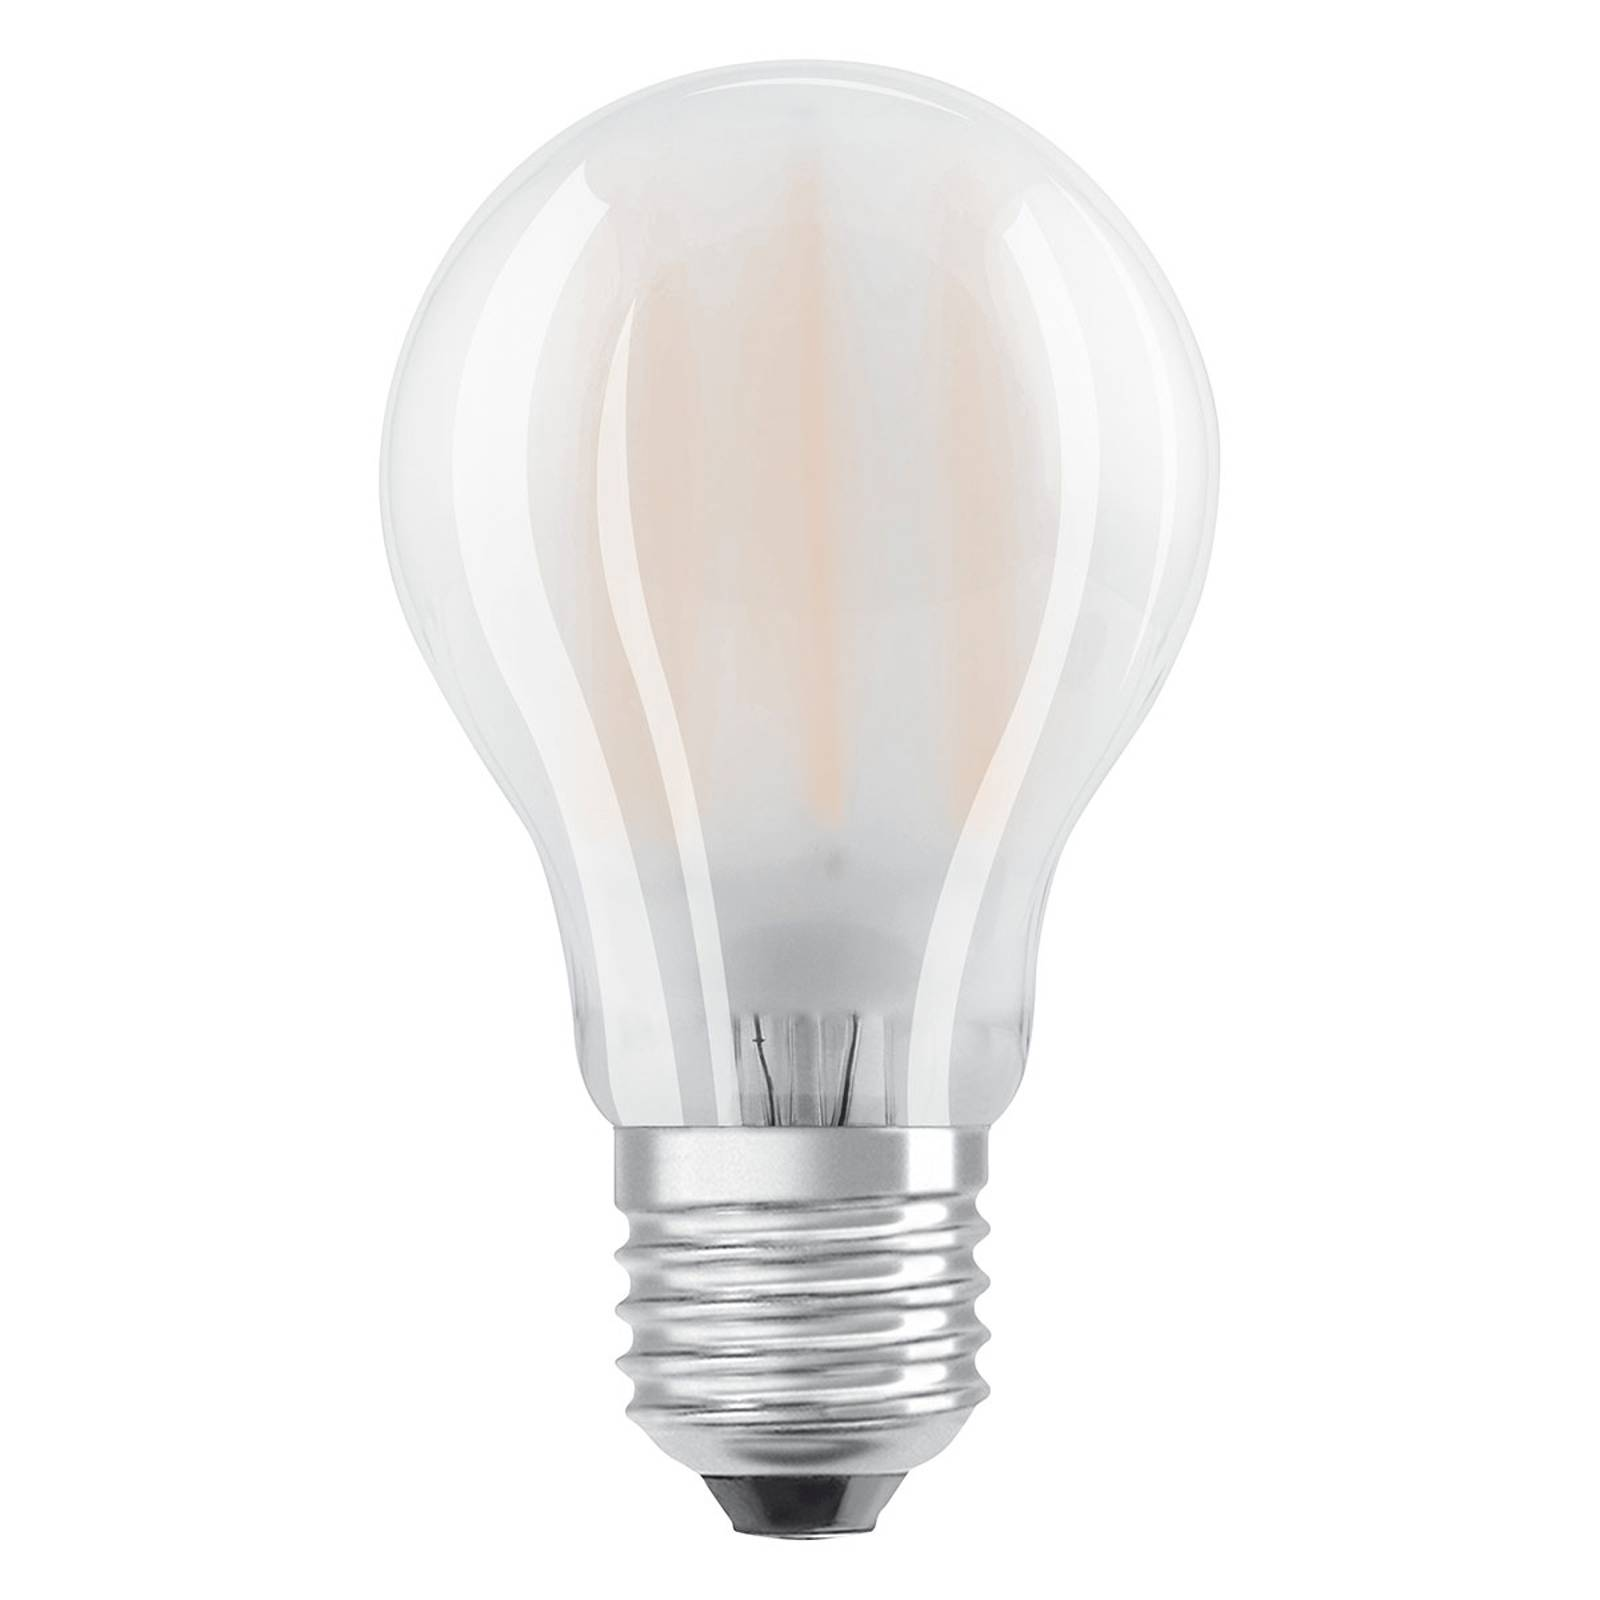 E27 7W 827 LED-lamppu 2 kpl:n setti, matta